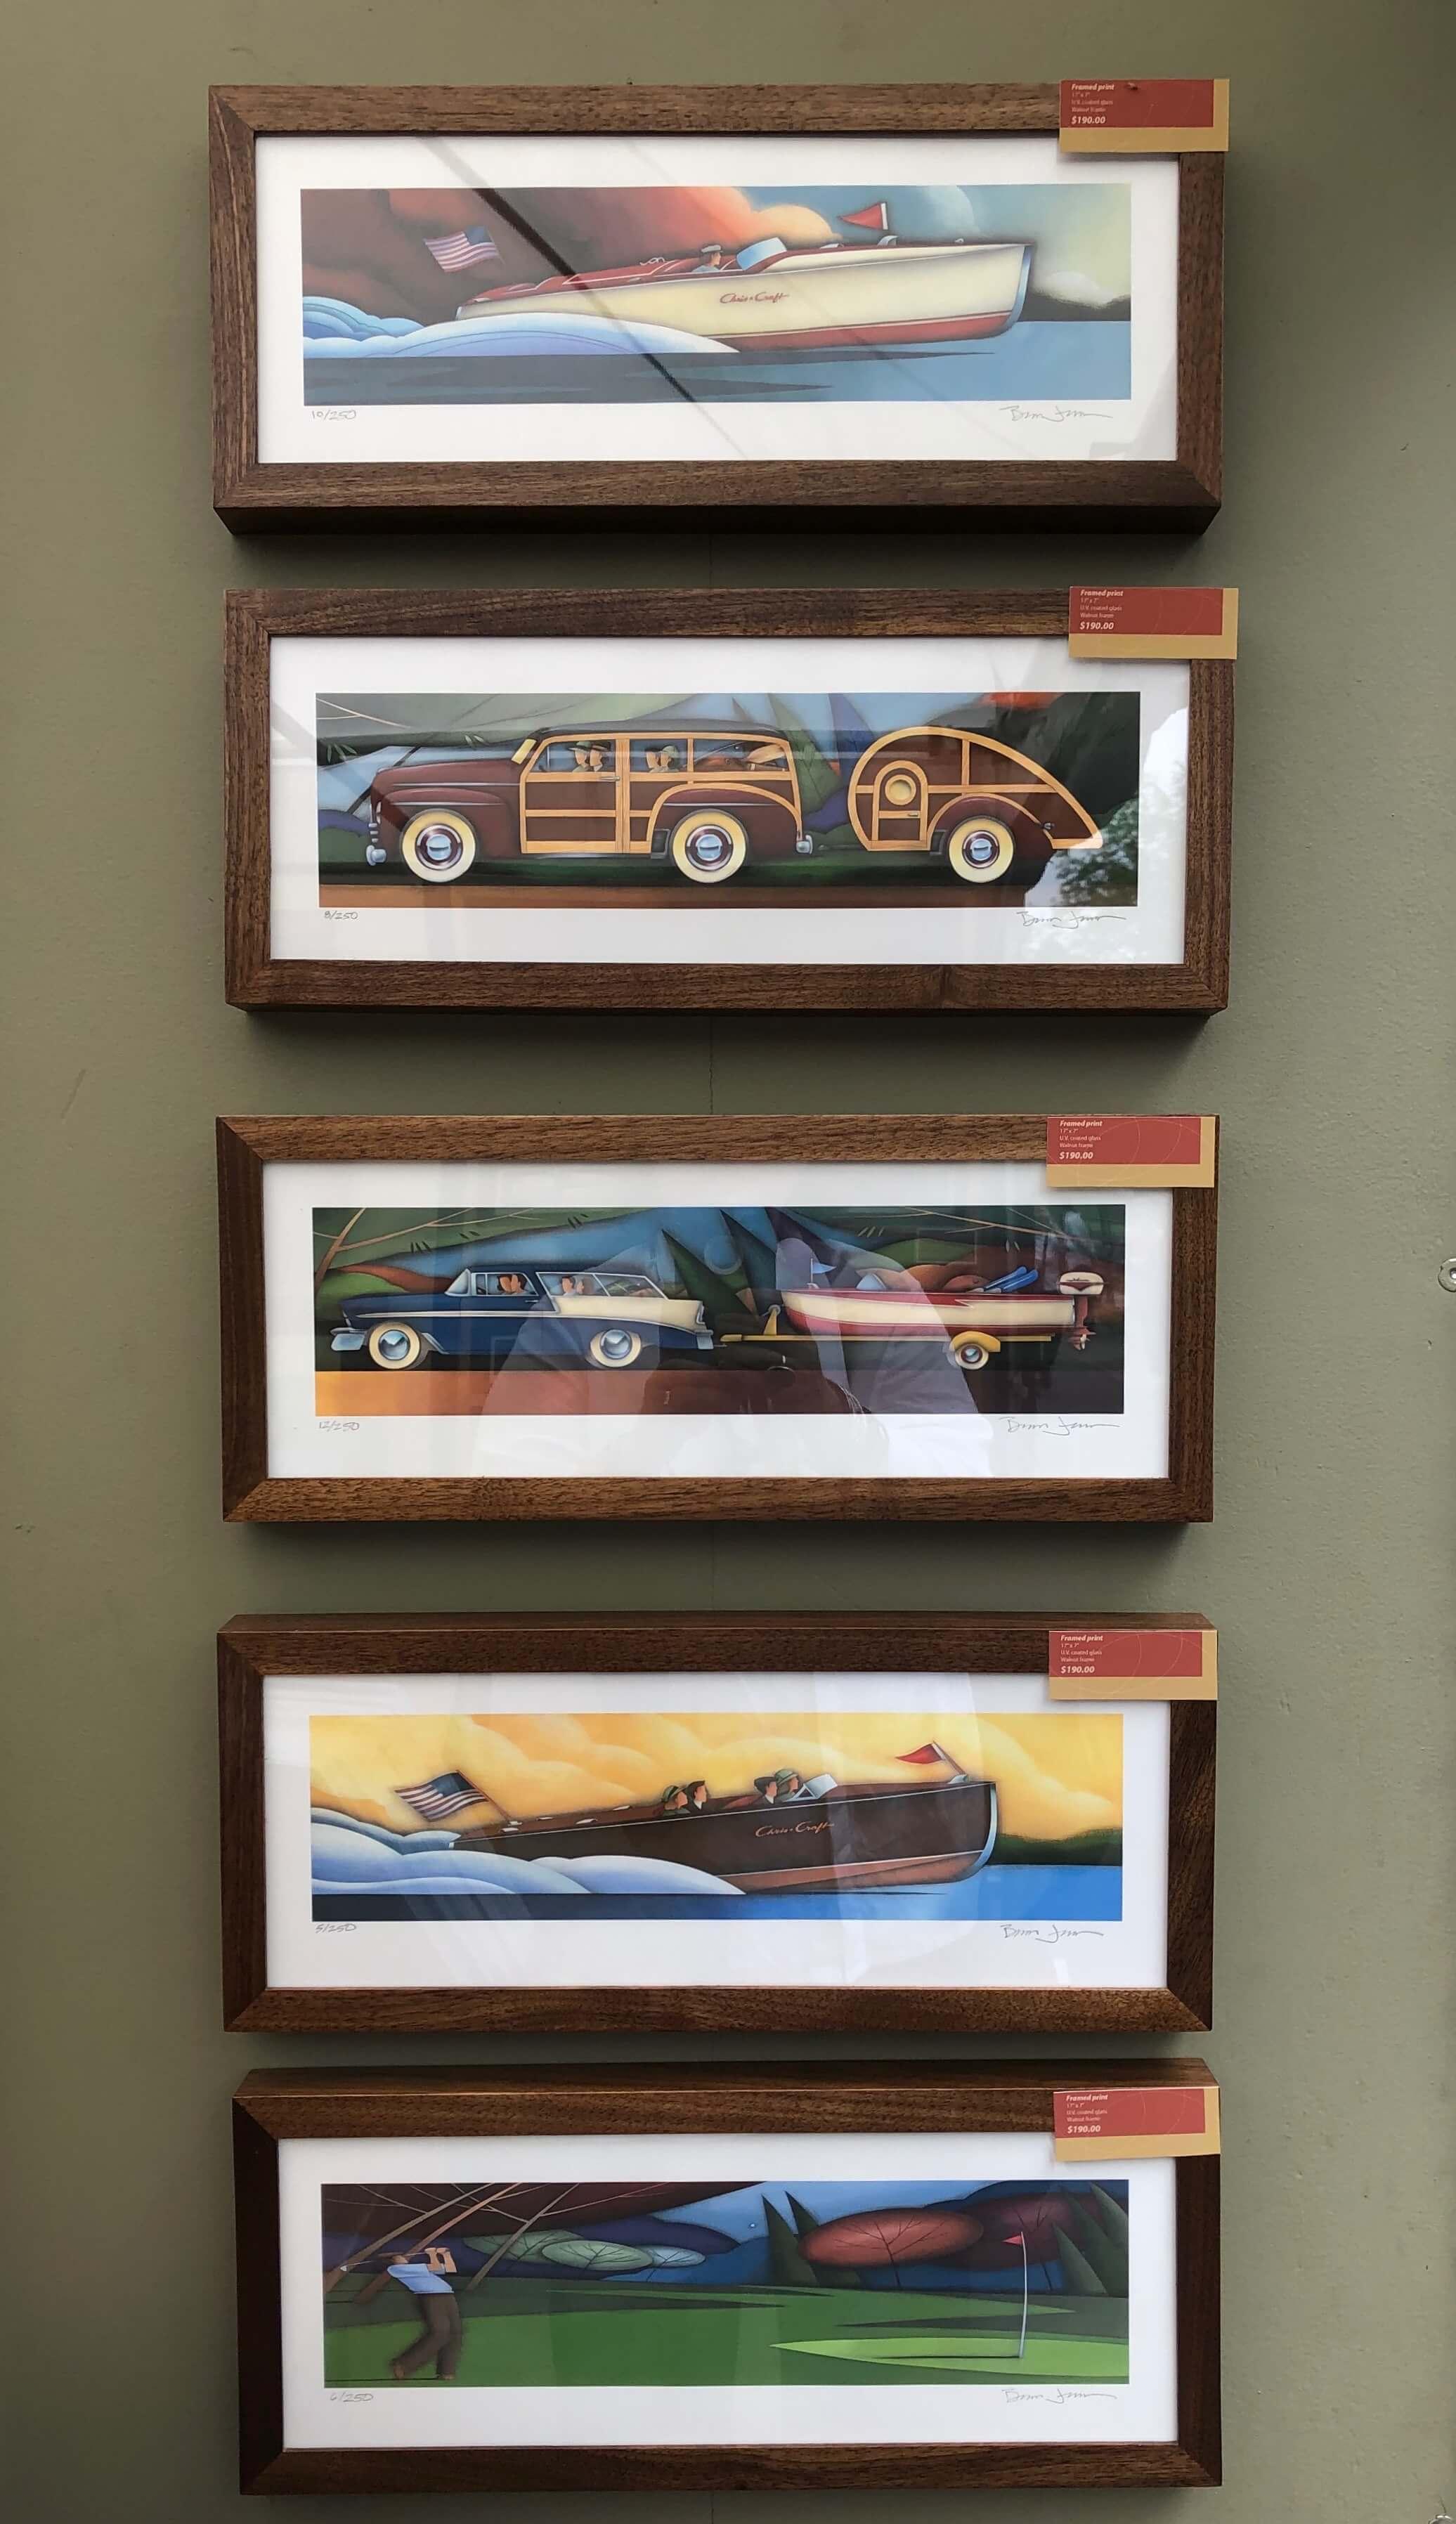 Artwork of artist, Brian Jensen, seen at The Woodlands Waterway Art Festival